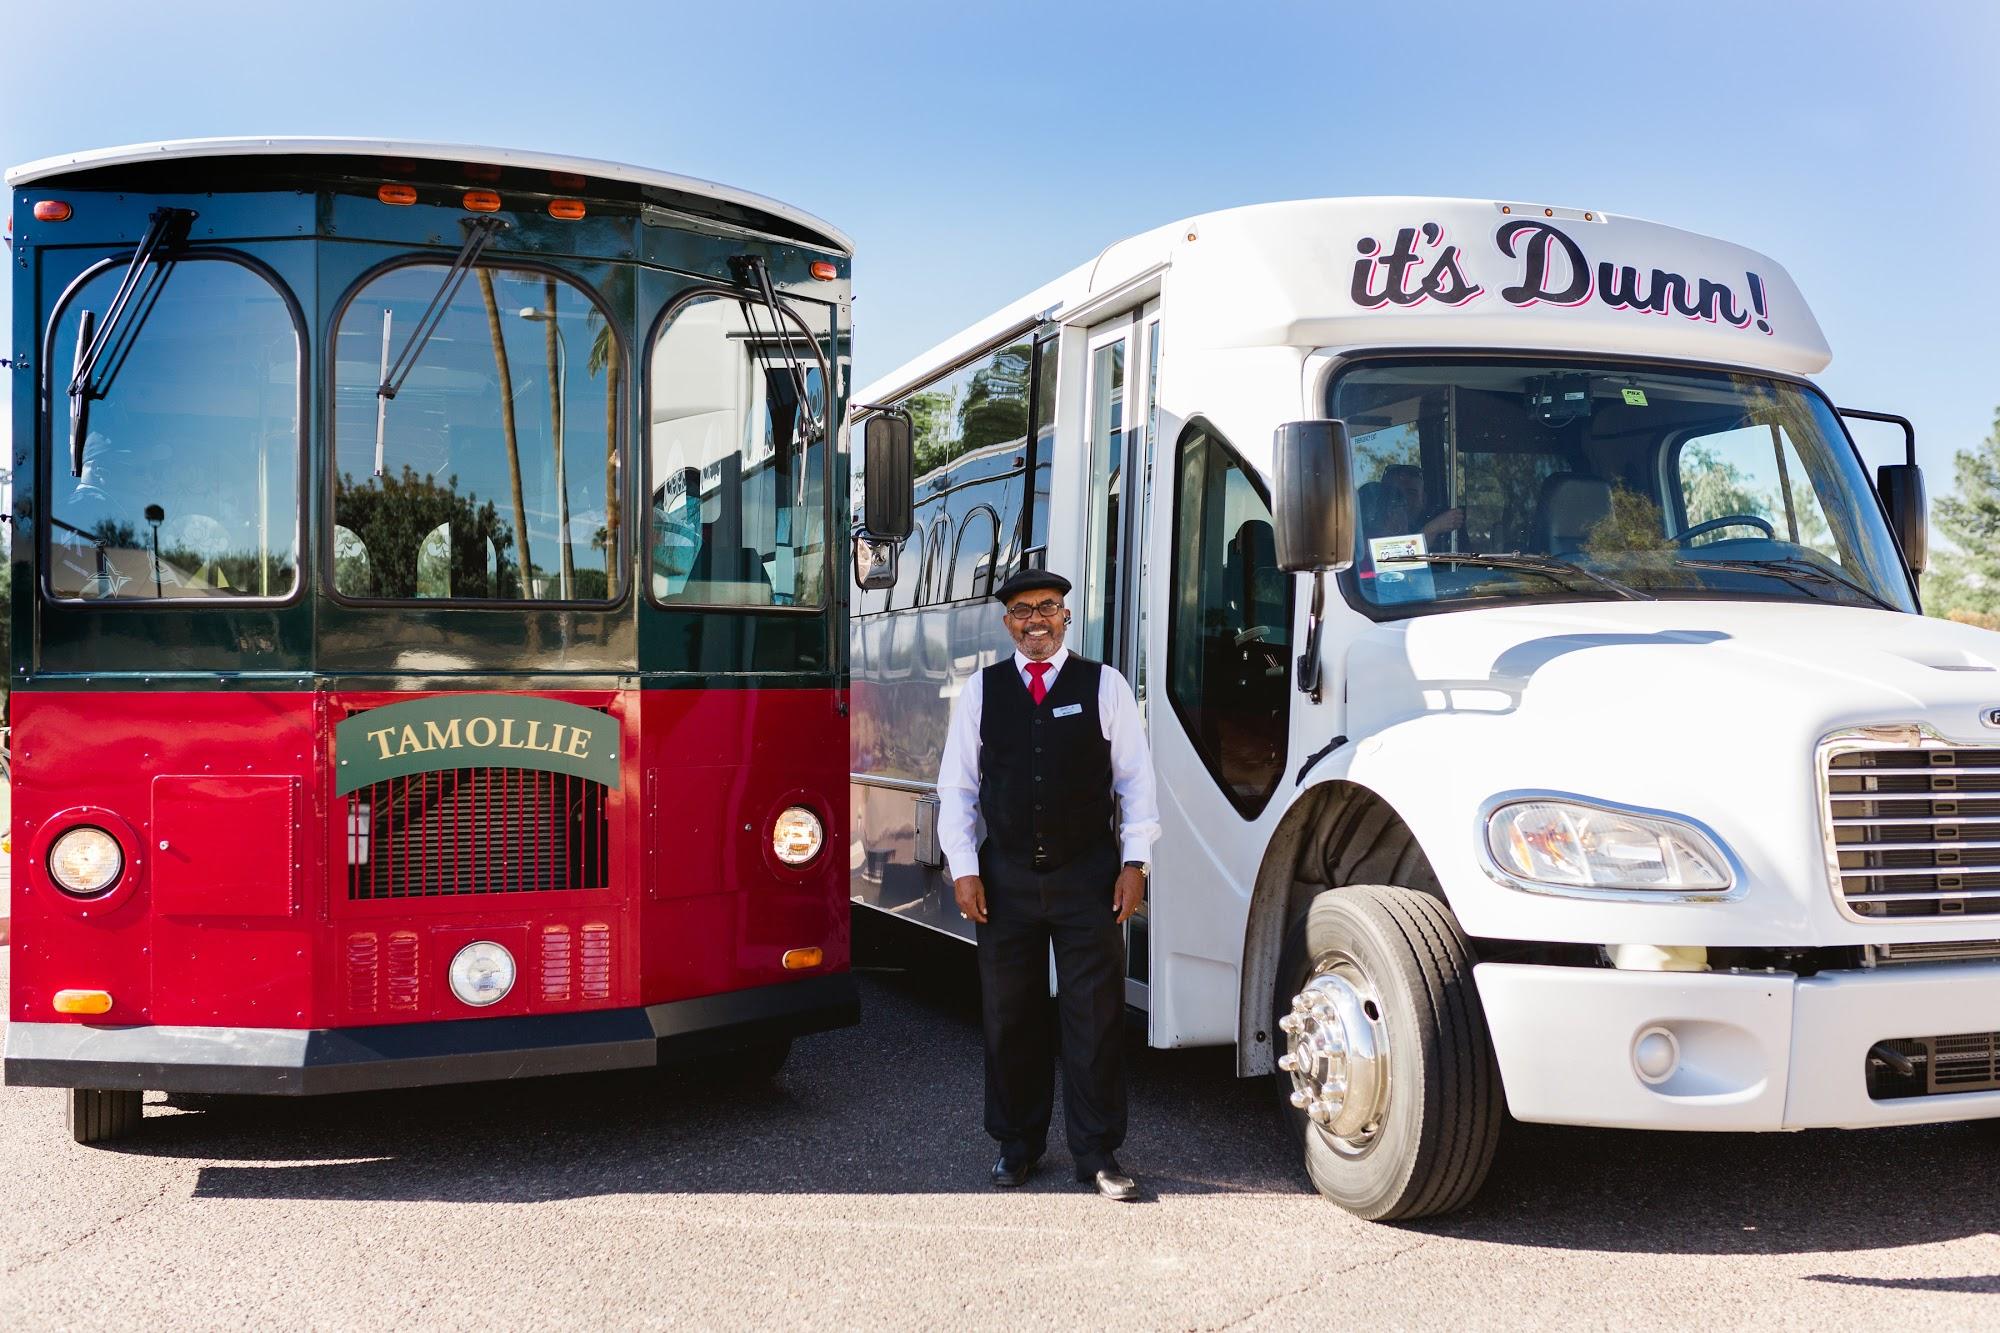 Dunn Transportation/Ollie the Trolley 1680 N 74th St, Scottsdale